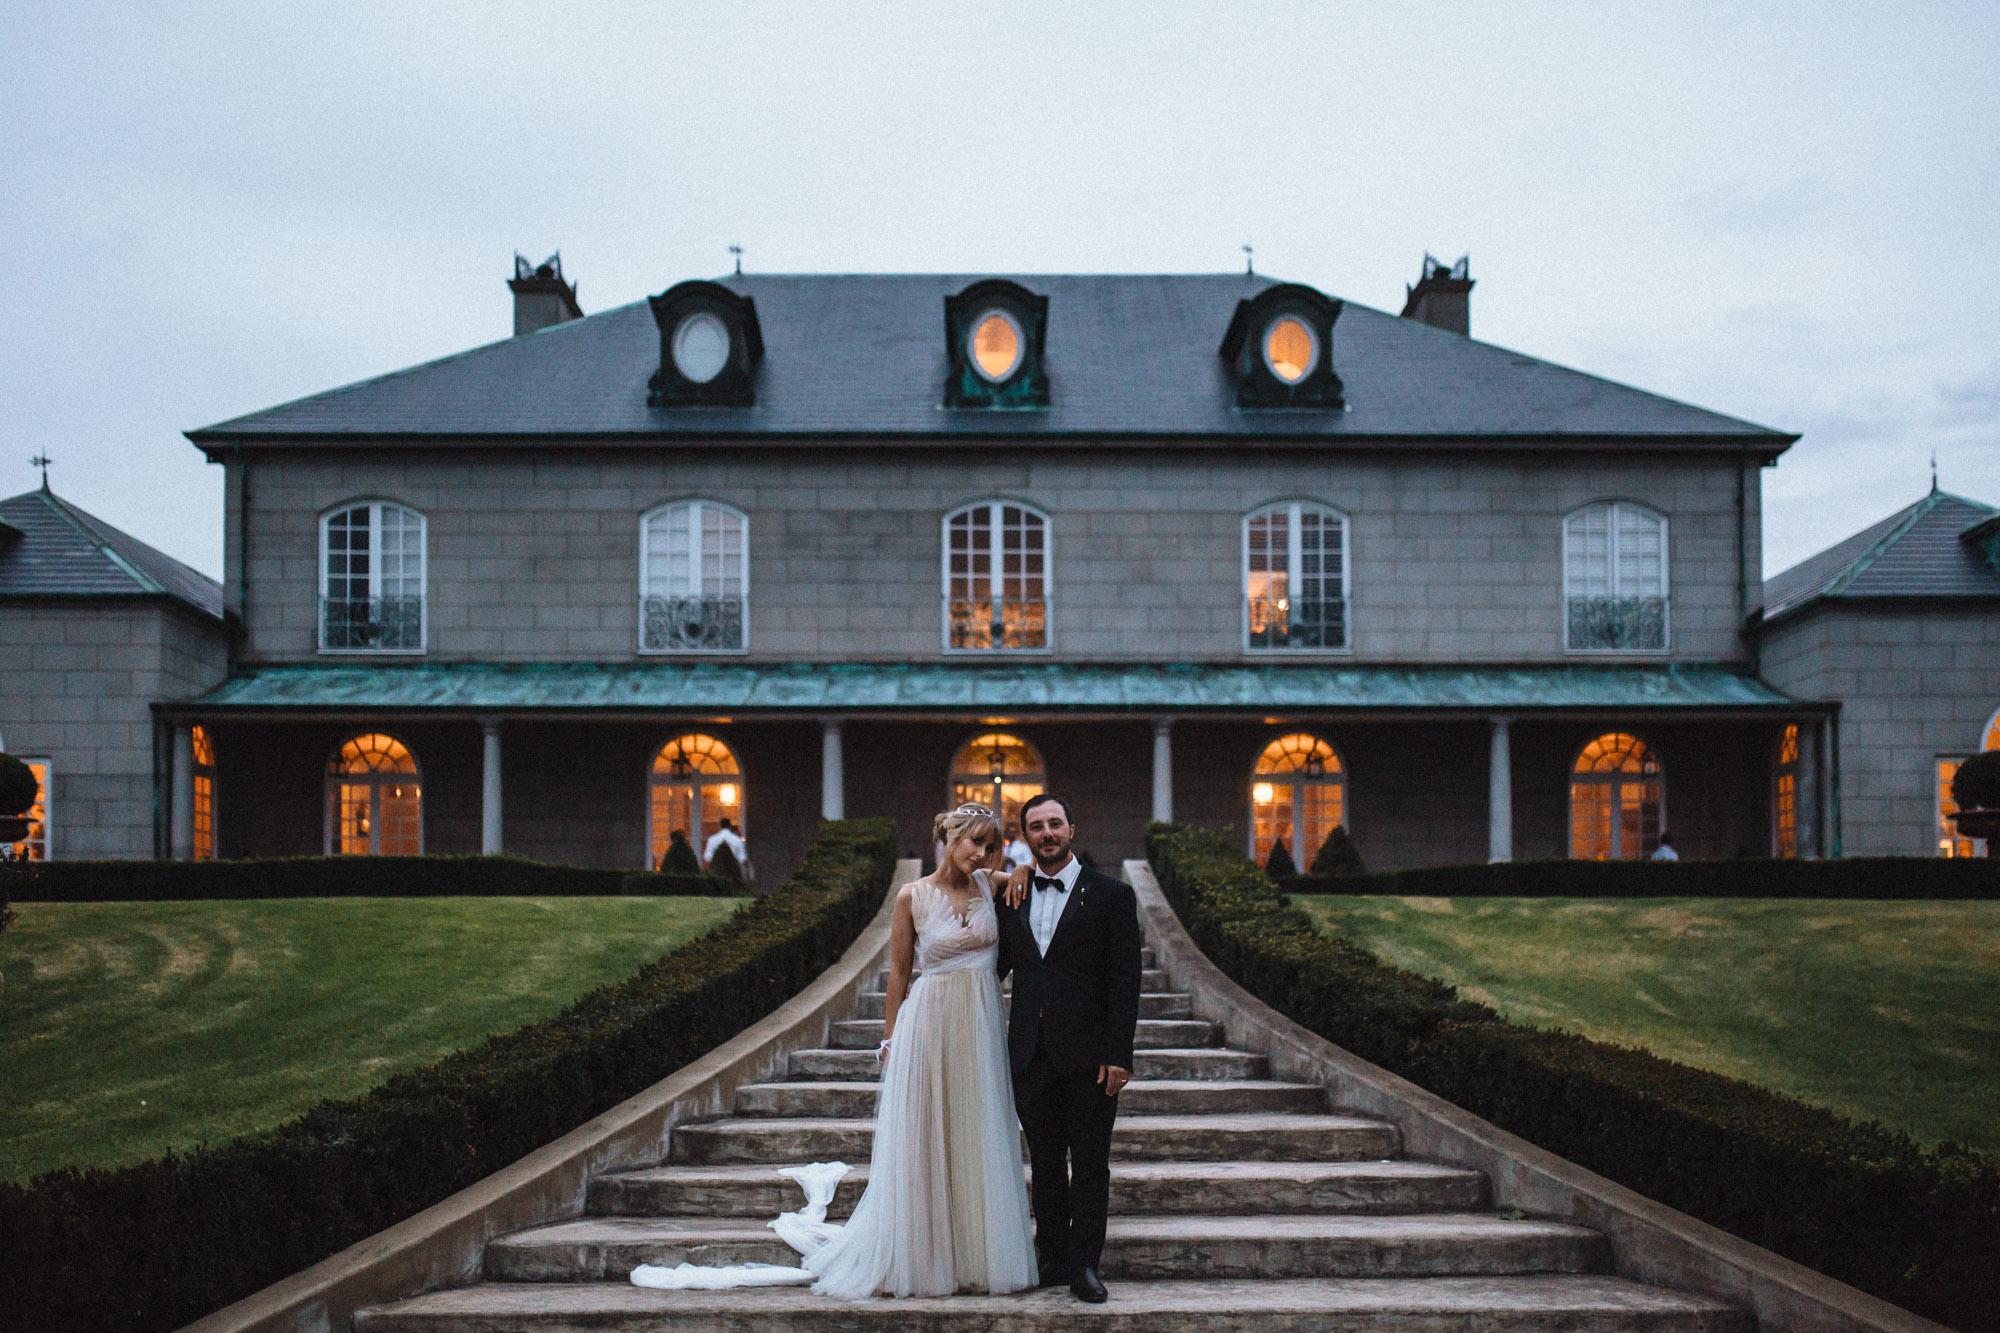 Campbell Point House Wedding HJ + Dean Raphael Weddings-129.jpg